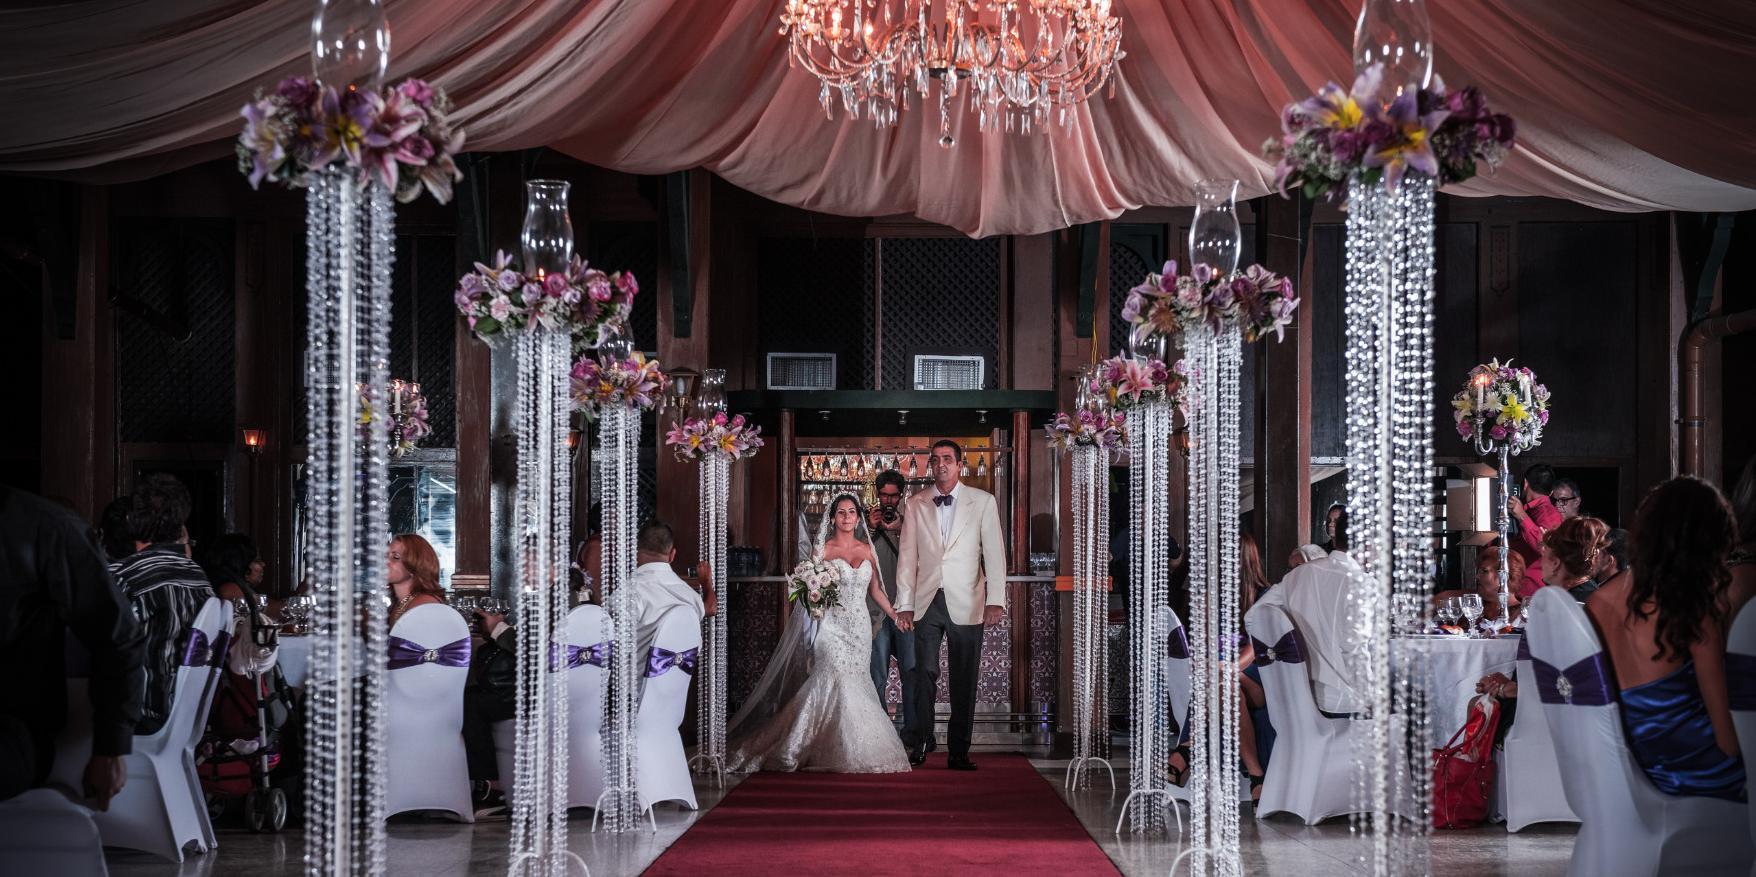 bodas-estilo-clasico-sin-tema-cuba-16651.jpg